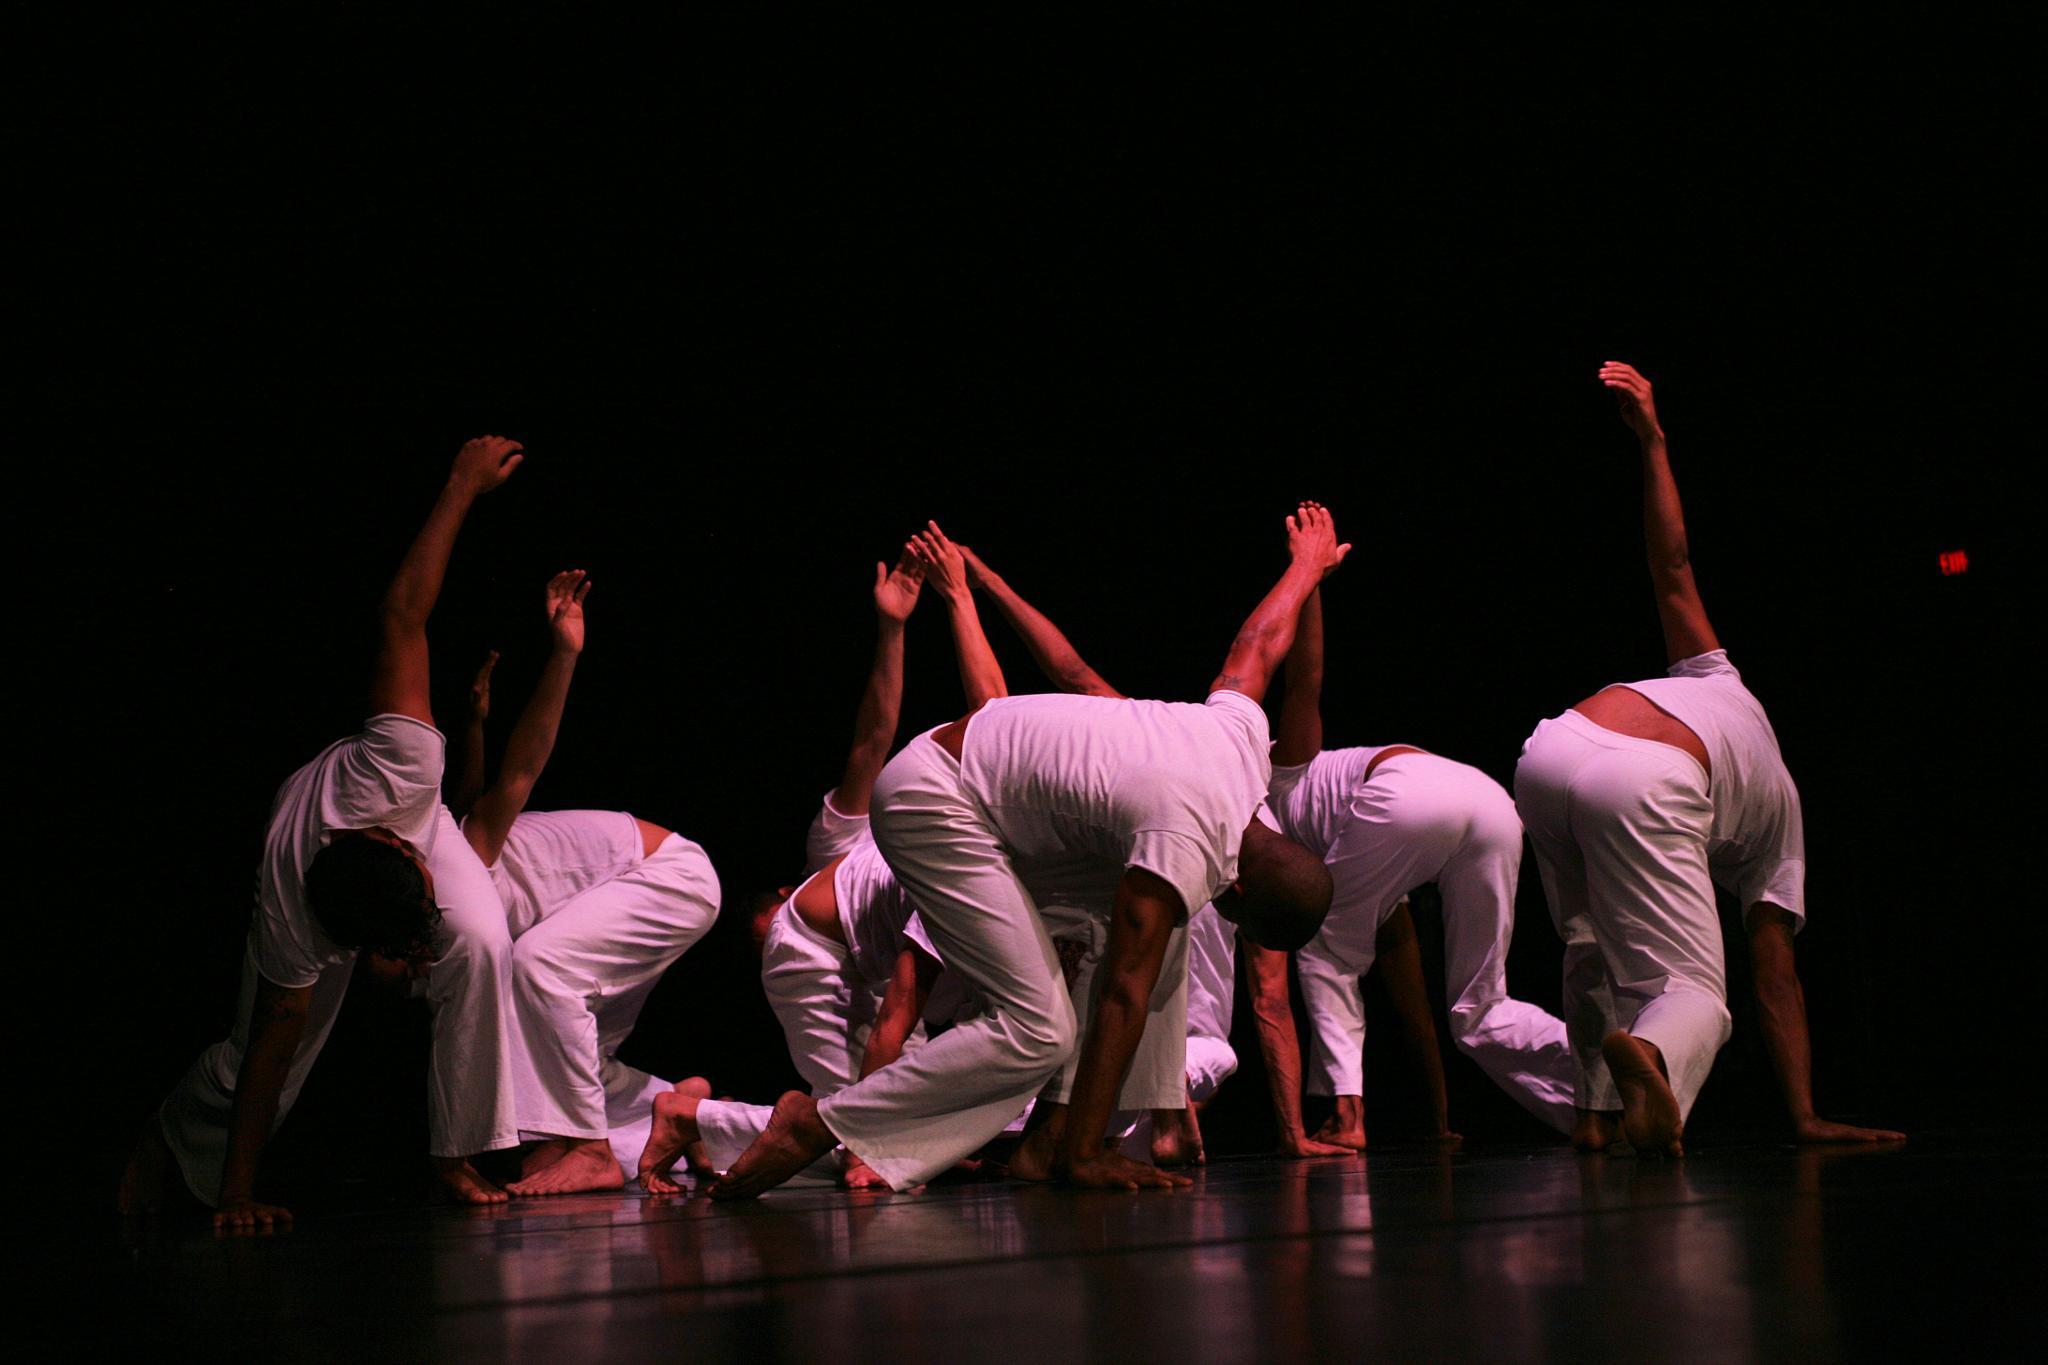 Dance Brazil by robteilets